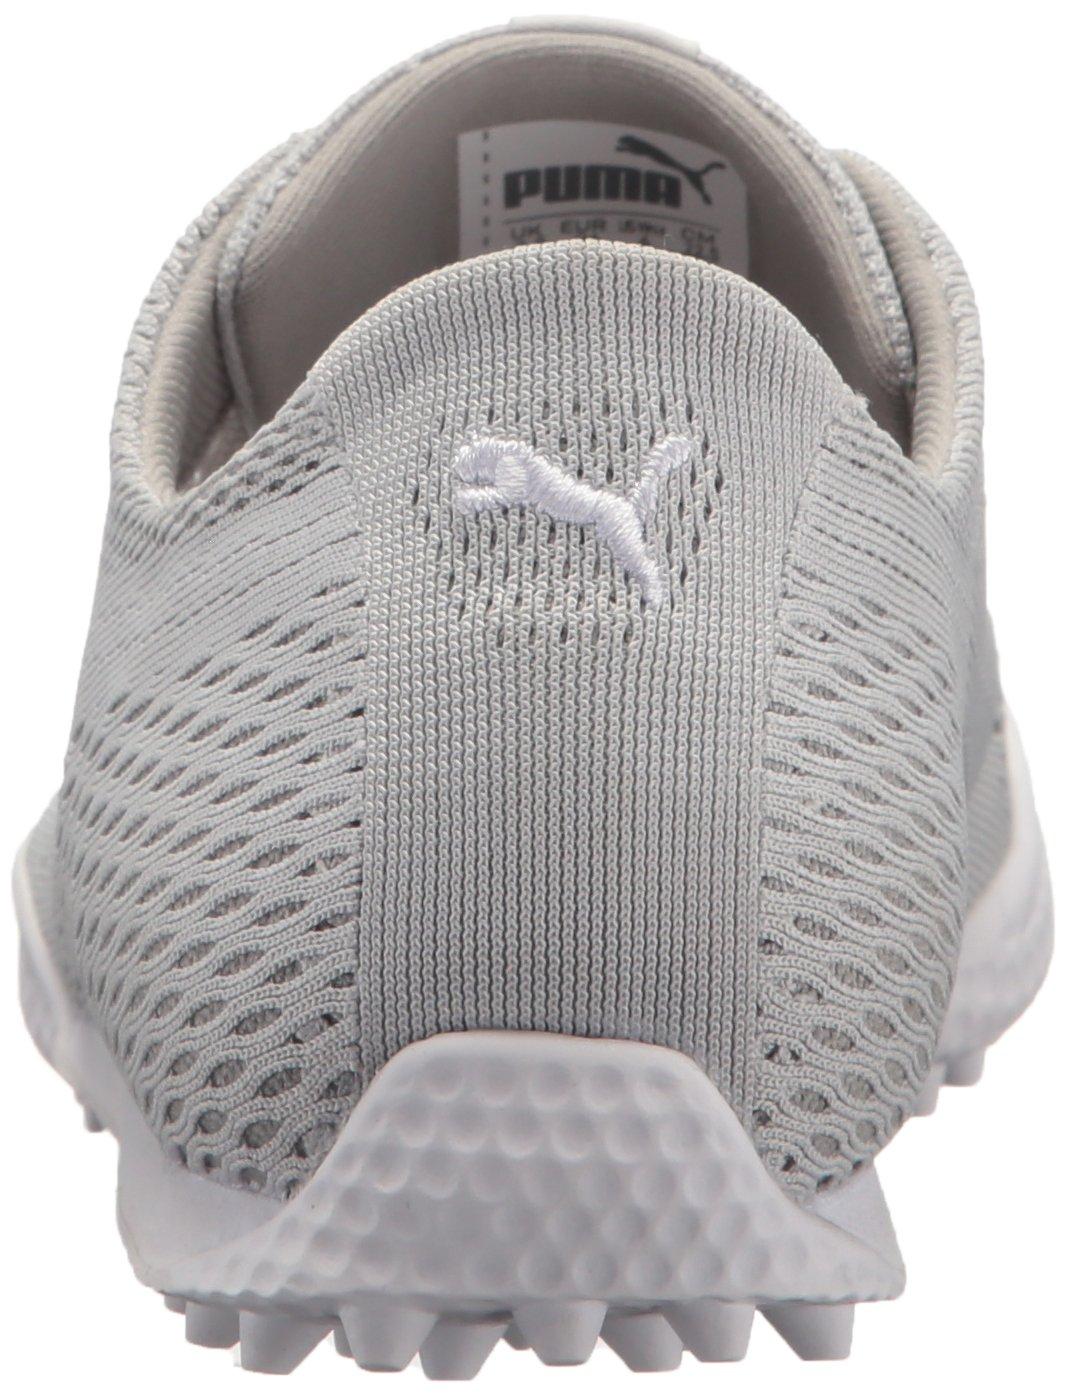 PUMA Women's B(M) Monolite Cat Woven Golf Shoe B074ZNMWRC 9 B(M) Women's US|Glacier Gray/Glacier Gray c66dc1